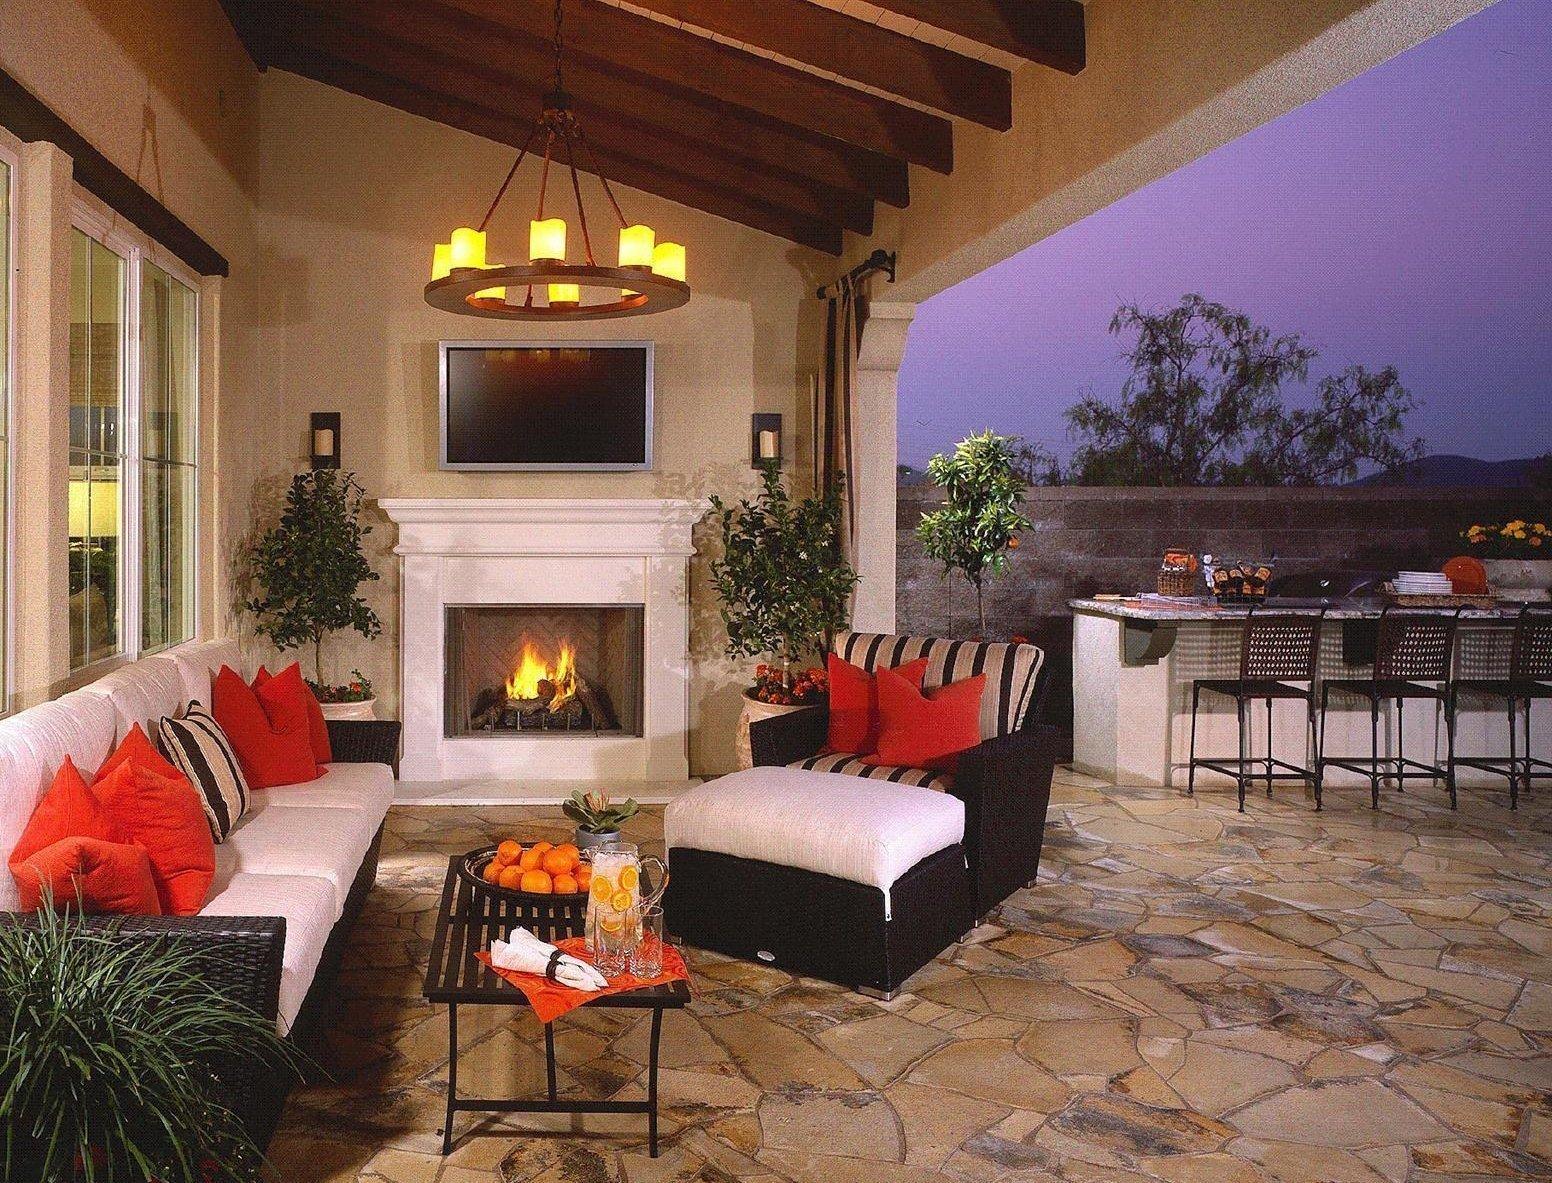 Del Sur homes feature outdoor rooms - The San Diego Union-Tribune